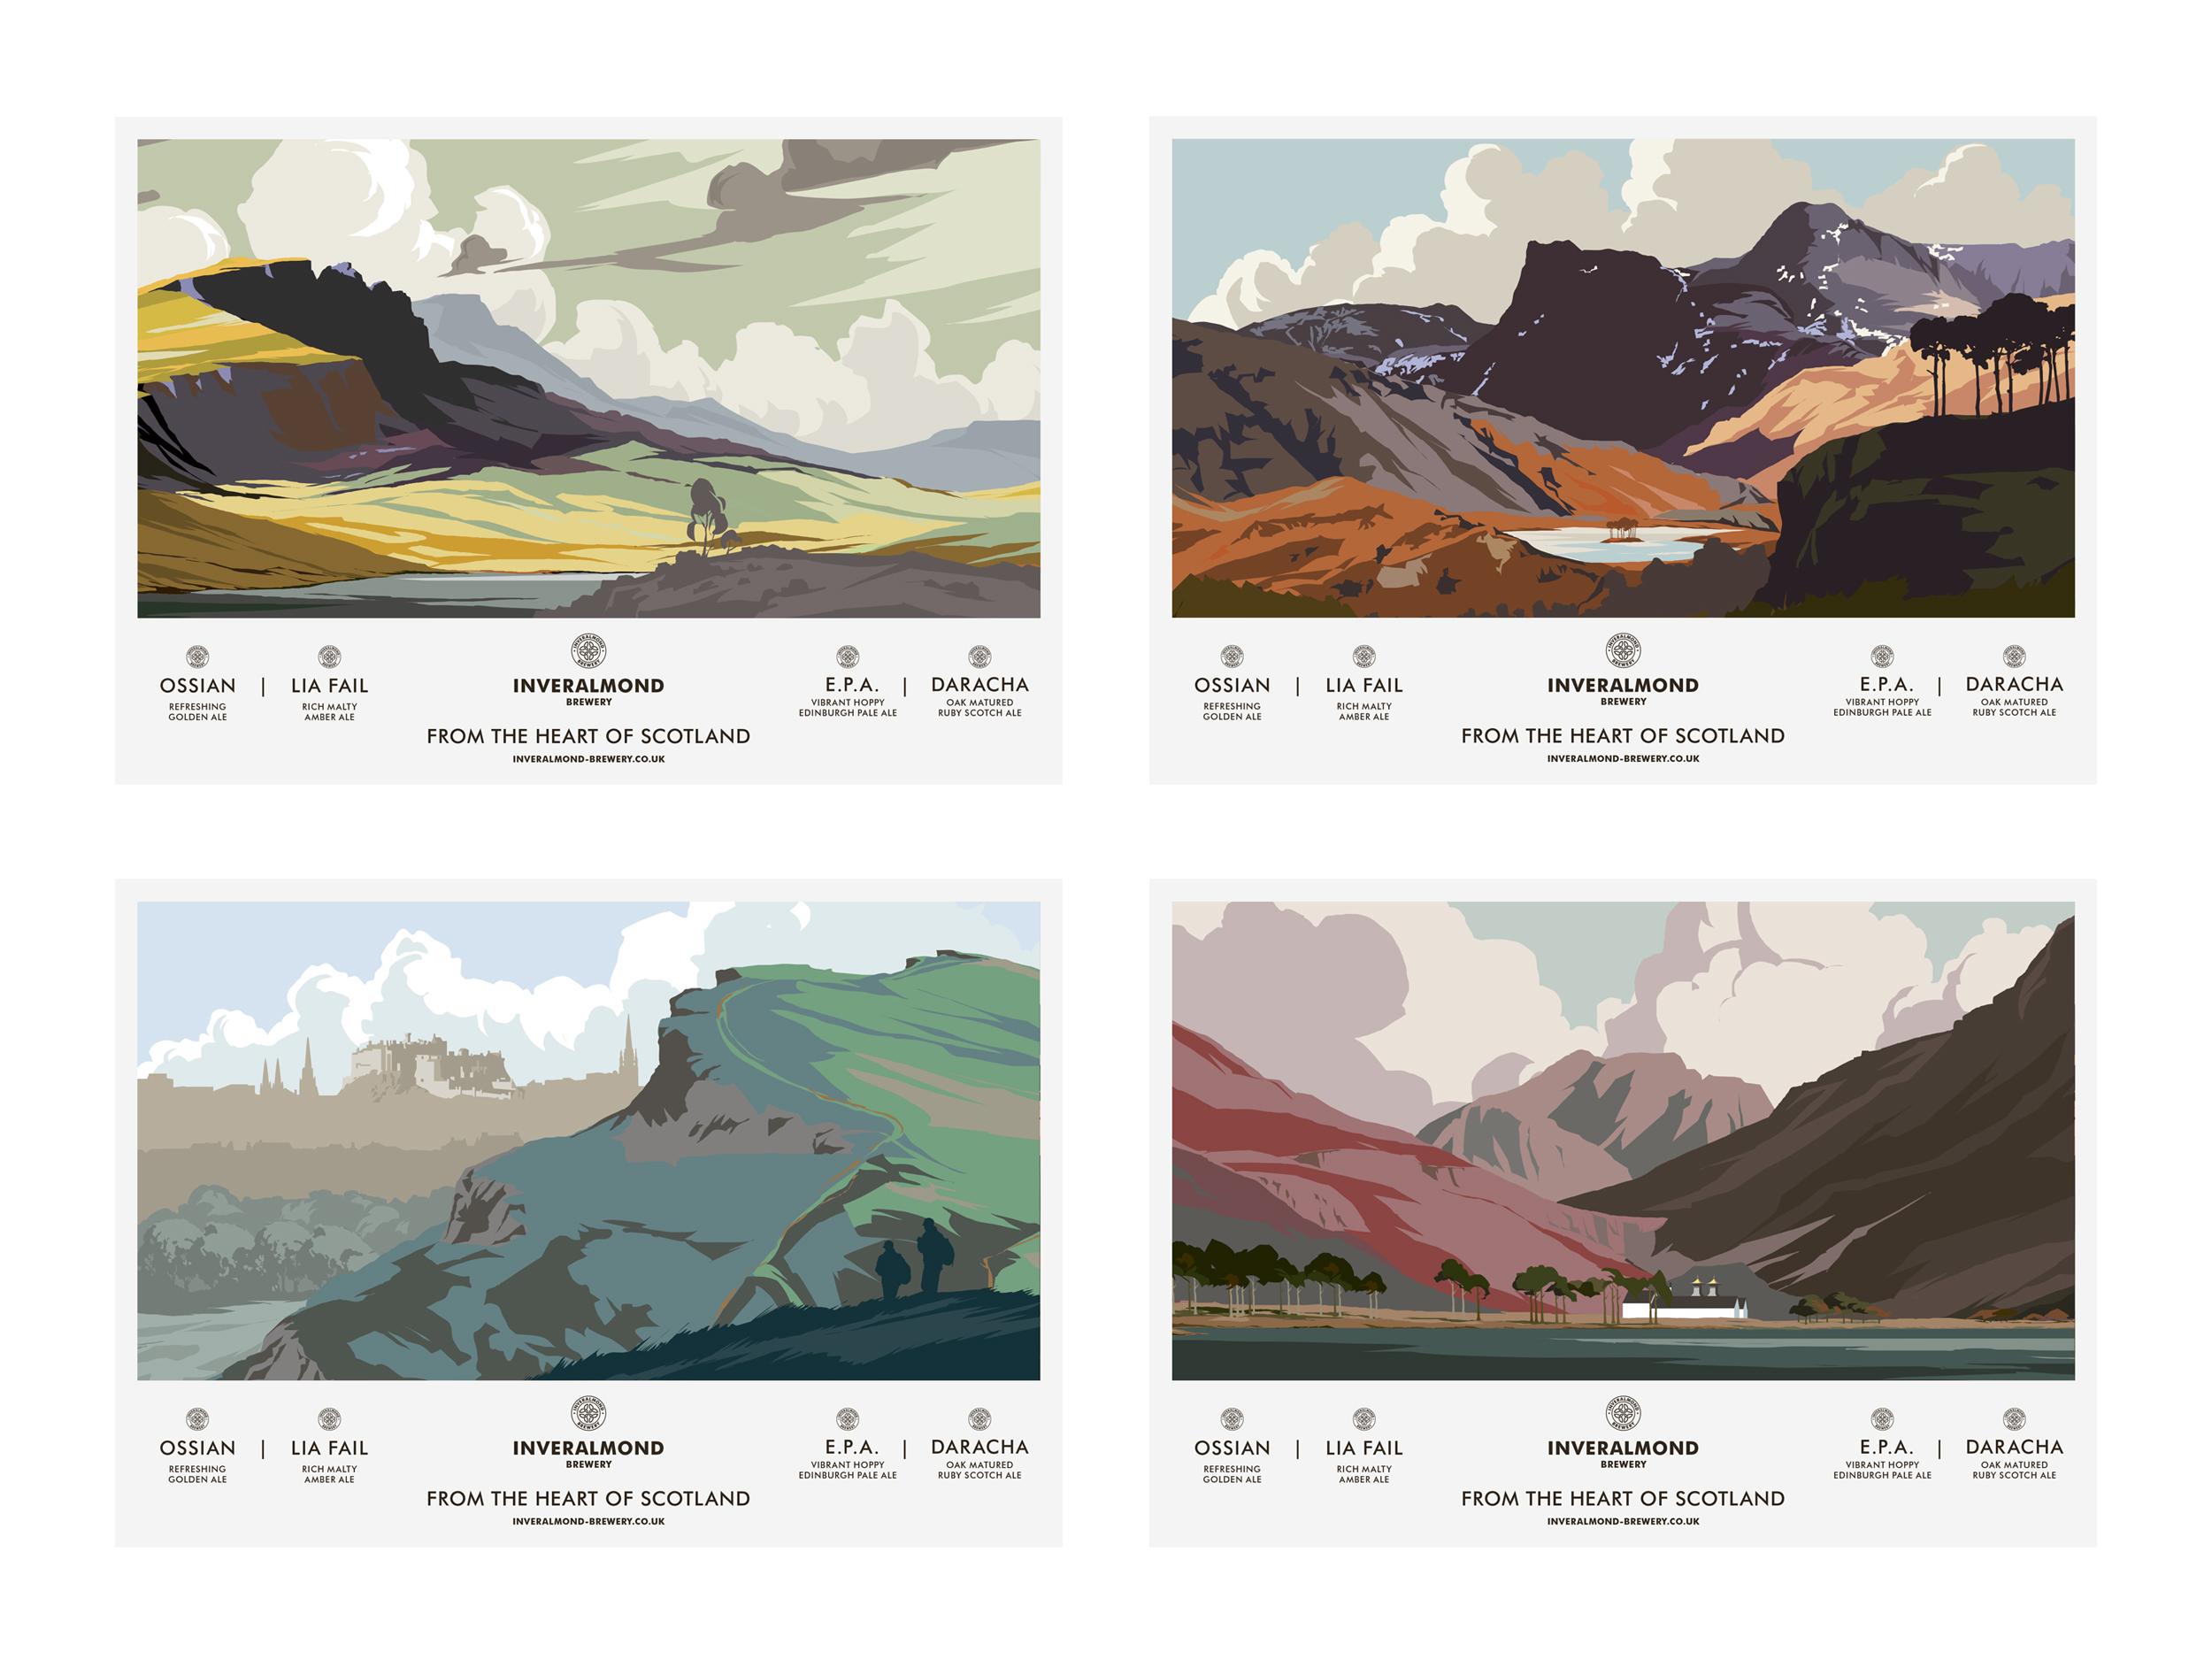 Postcards for Inveralmond featuring McDermott's artwork